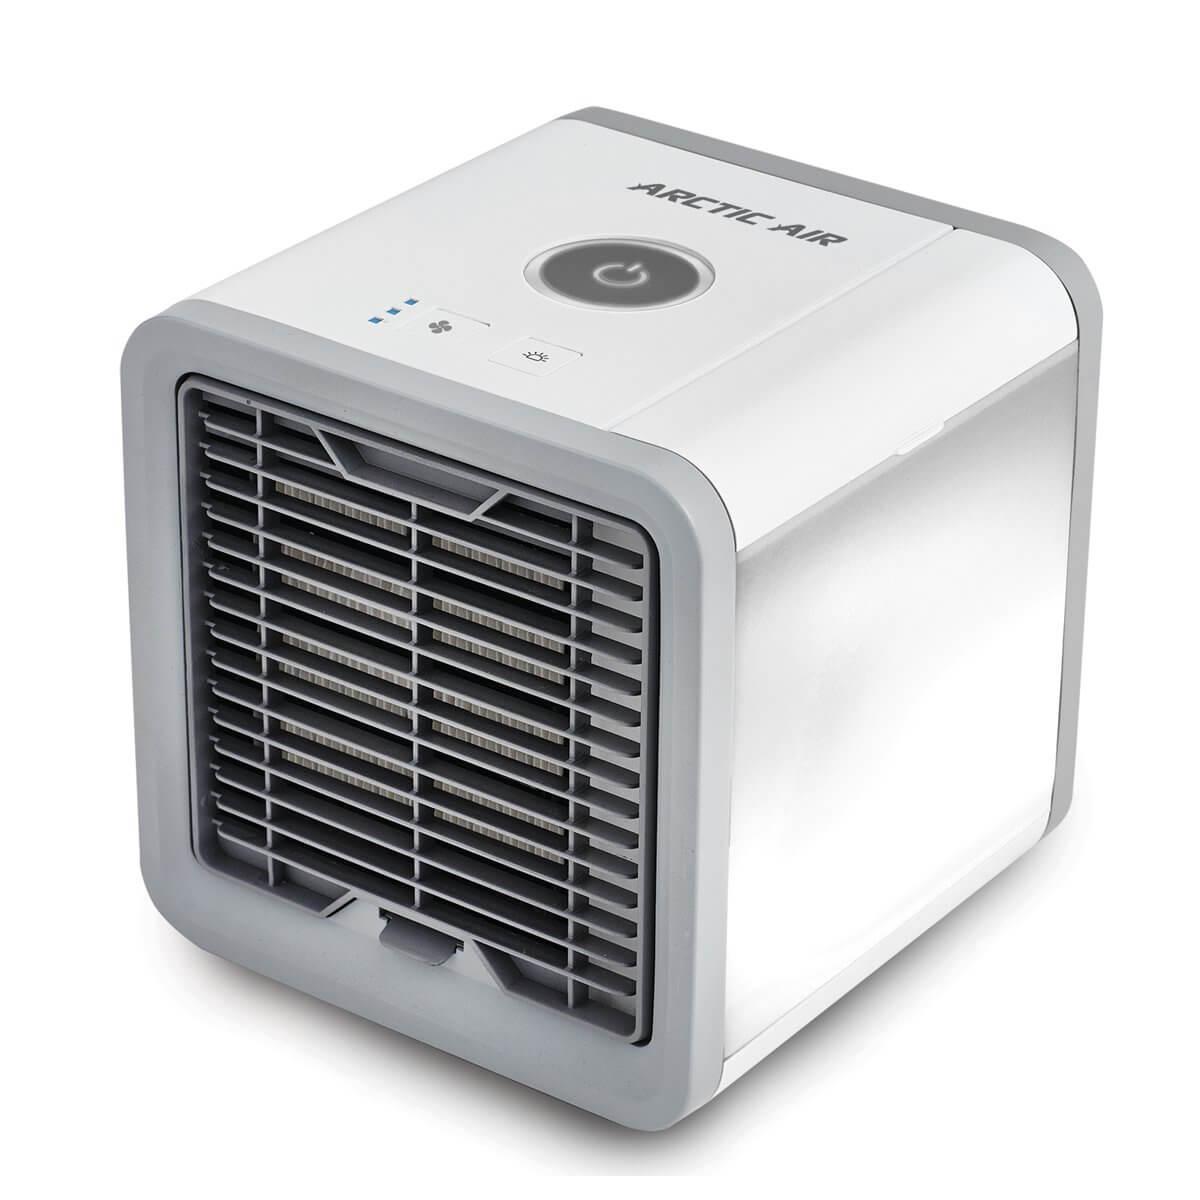 JML Arctic Air – Portable Personal Space Air Cooler